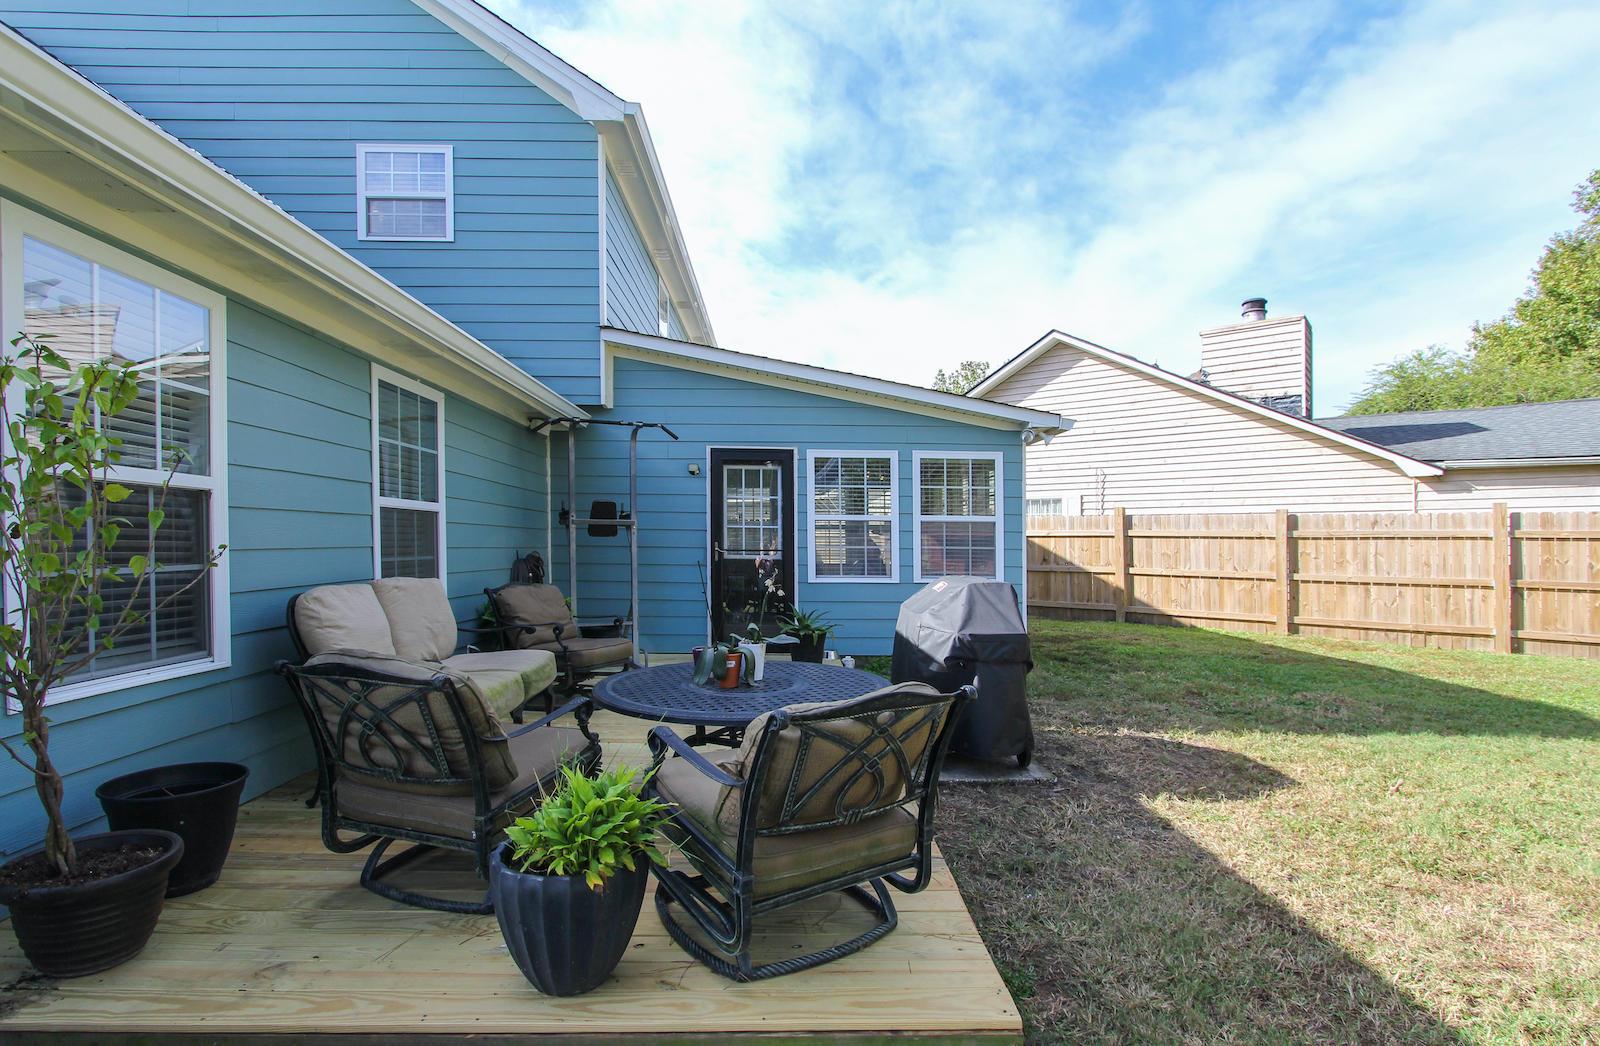 Landings Run Homes For Sale - 1548 Wickfield, Mount Pleasant, SC - 5